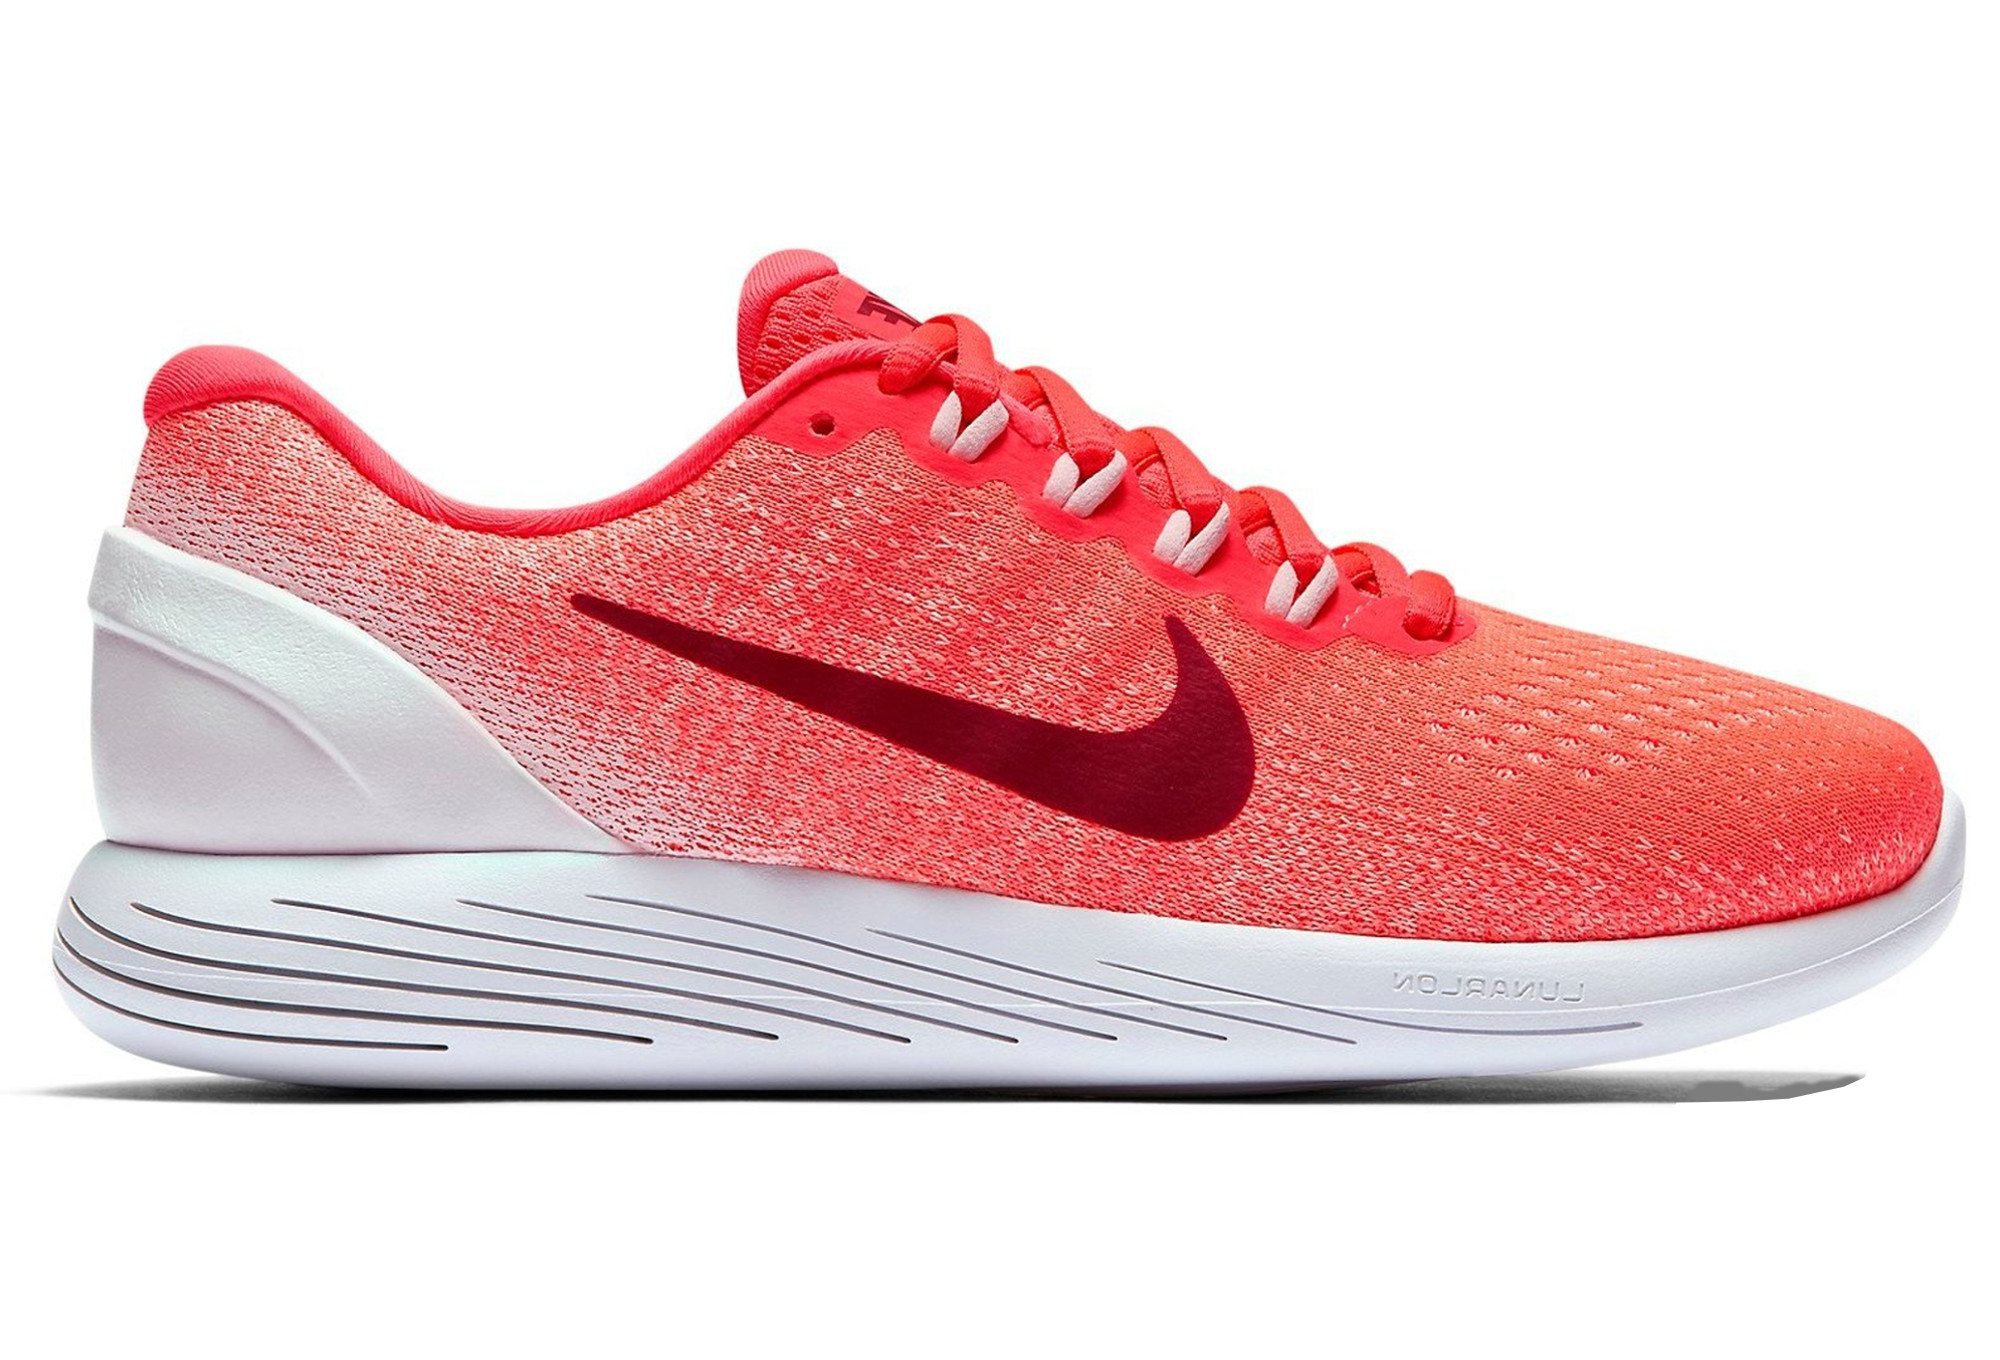 it Donna Red Lunarglide Nike Alltricks 9 wqzXS